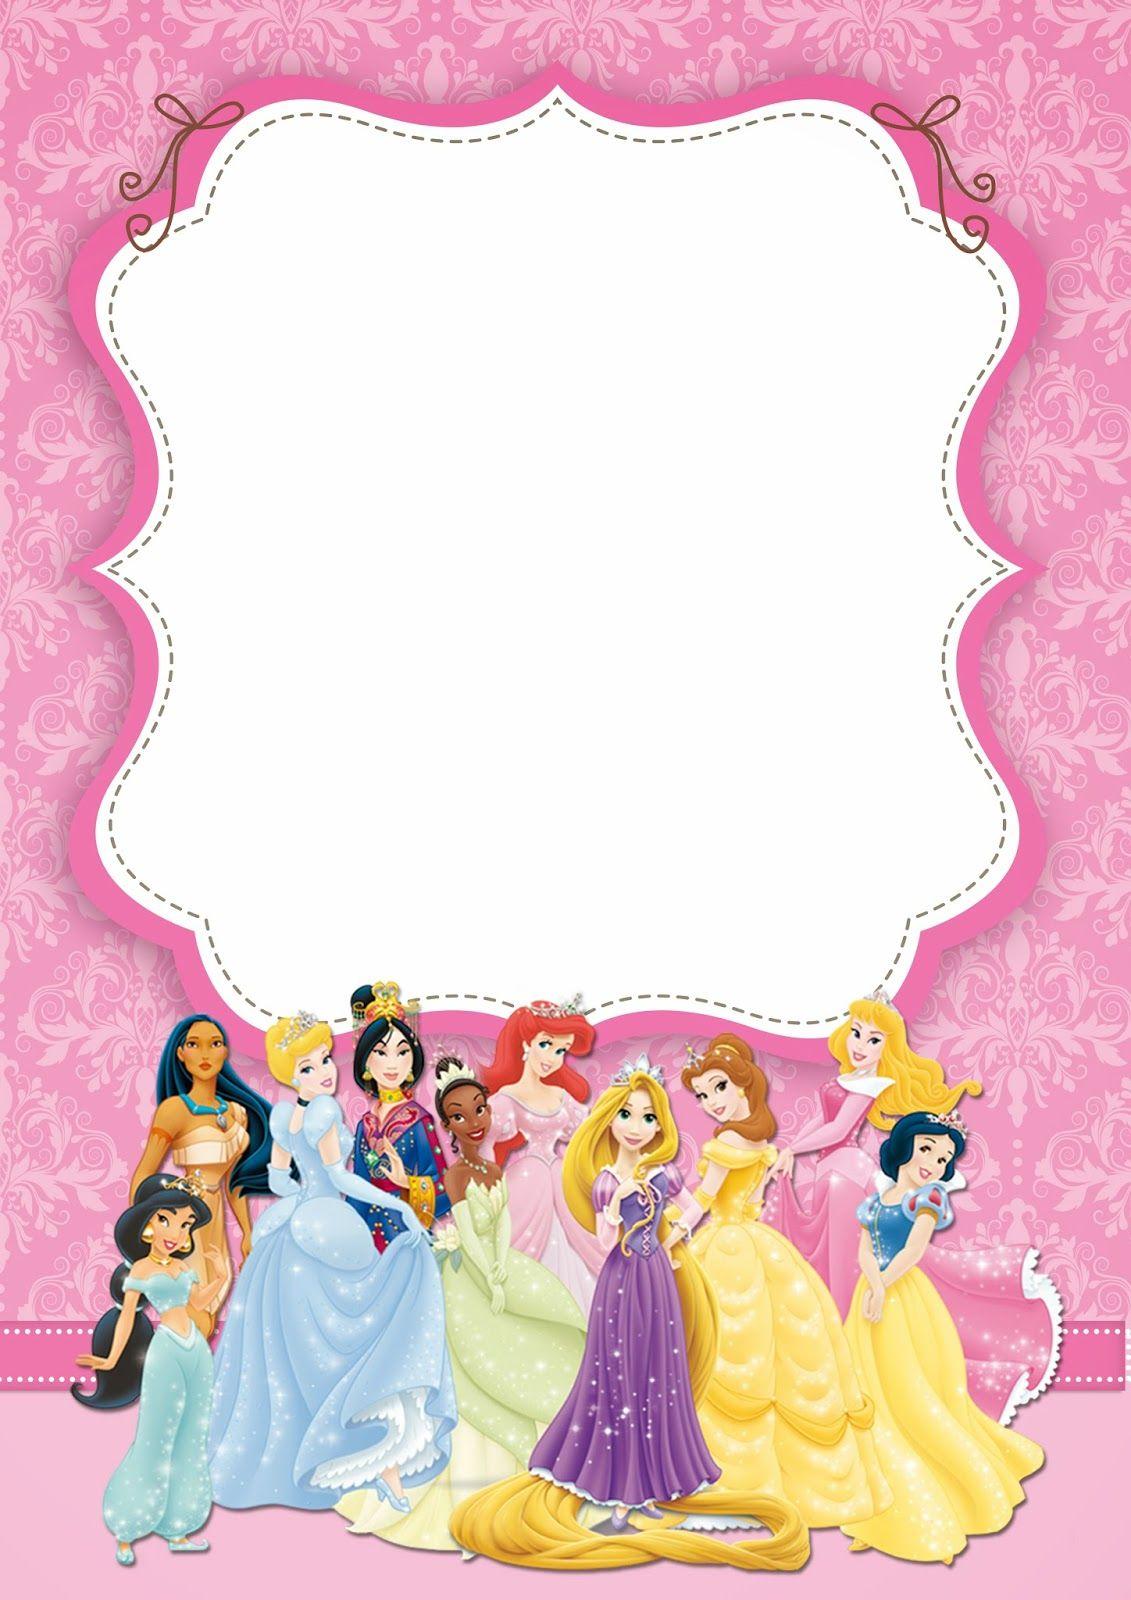 Disney Princess: Free Printable Party Invitations.   Princesse - Disney Princess Free Printable Invitations